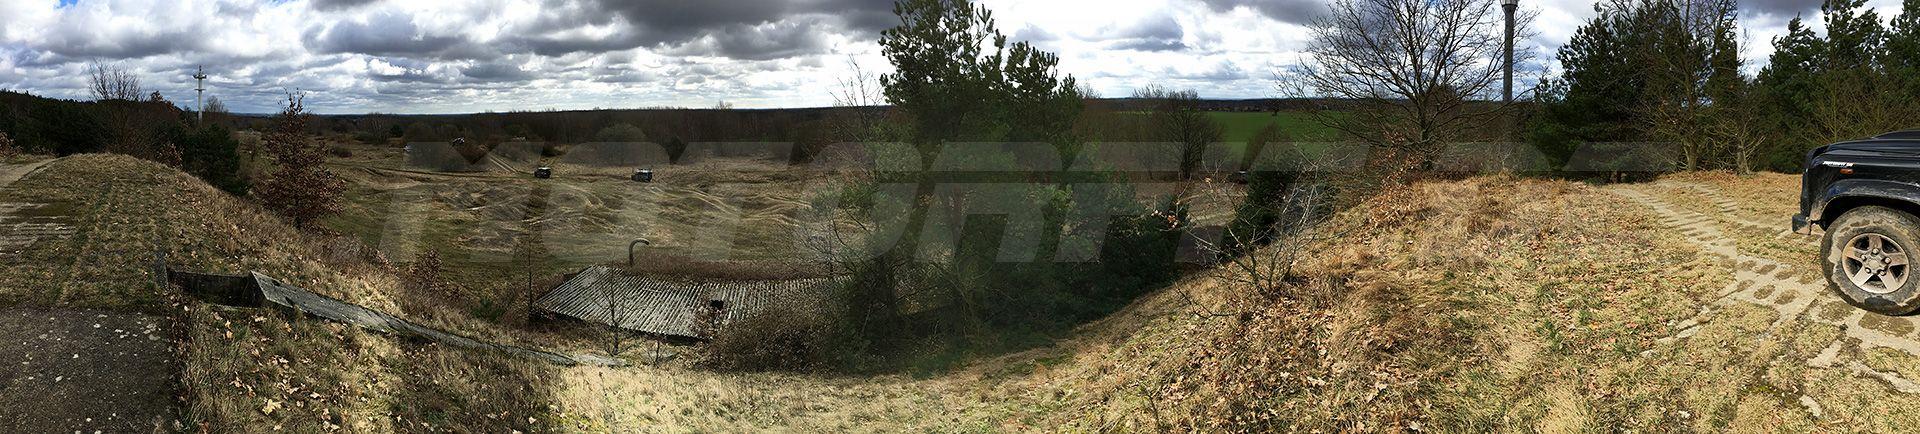 Landrover Defender - Safari Ausfahrt 2017